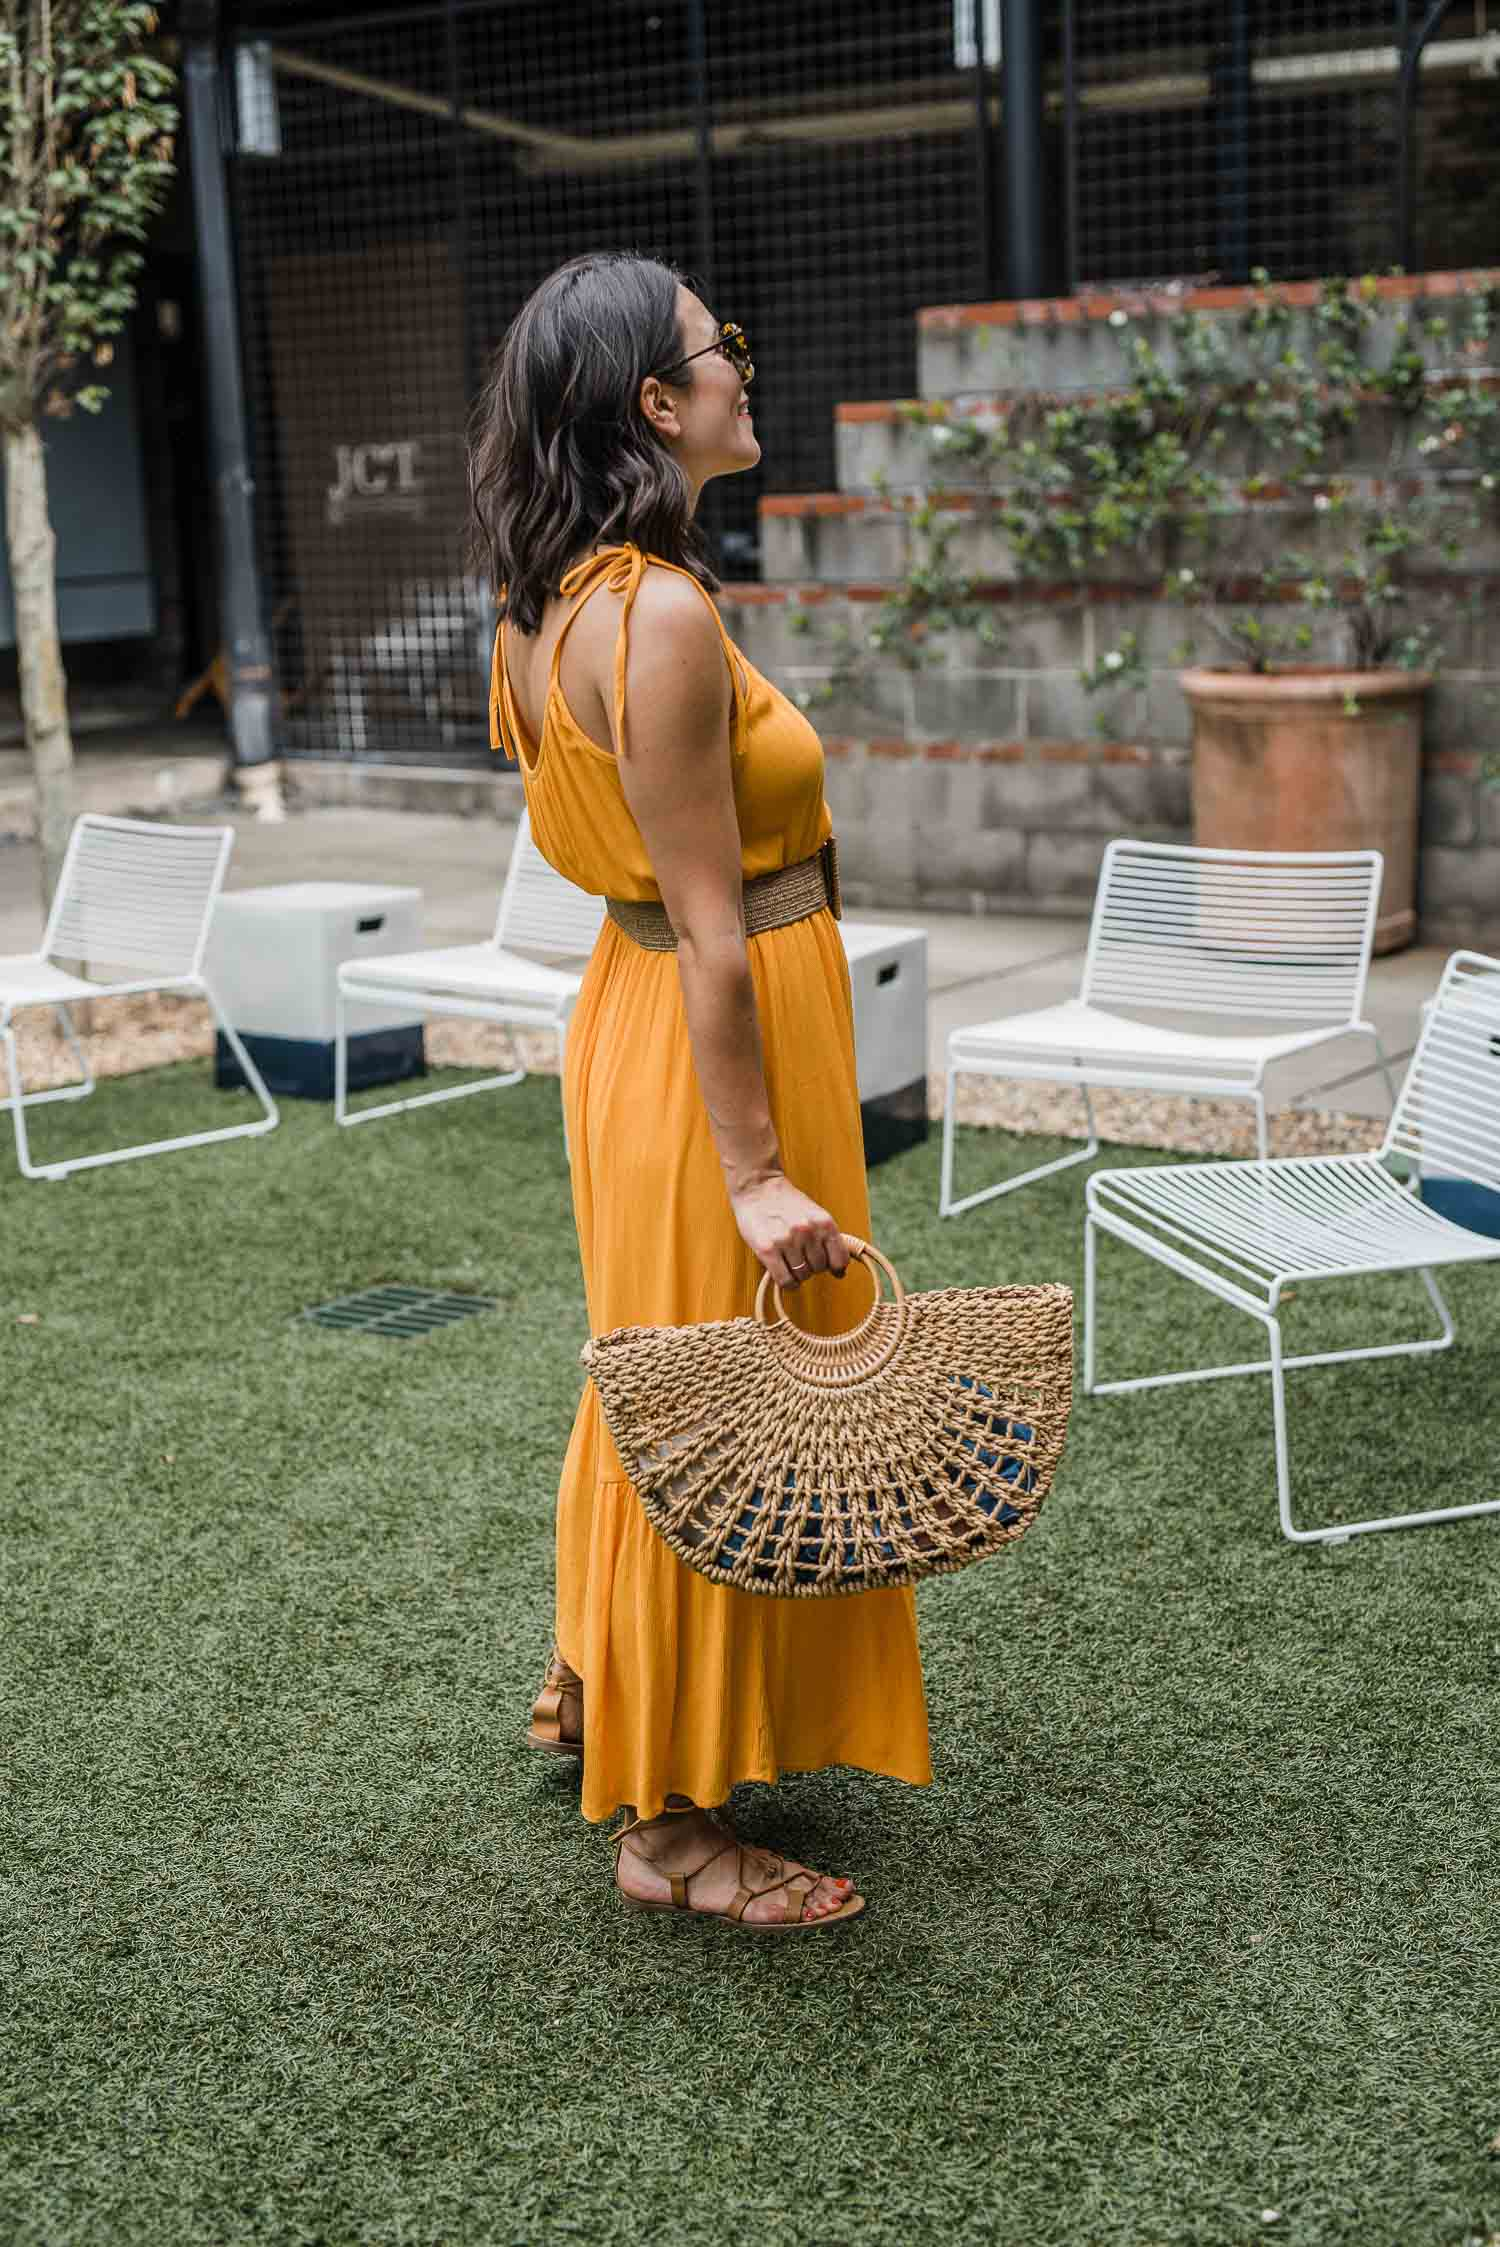 Jessica Camerata is sharing an orange maxi dress